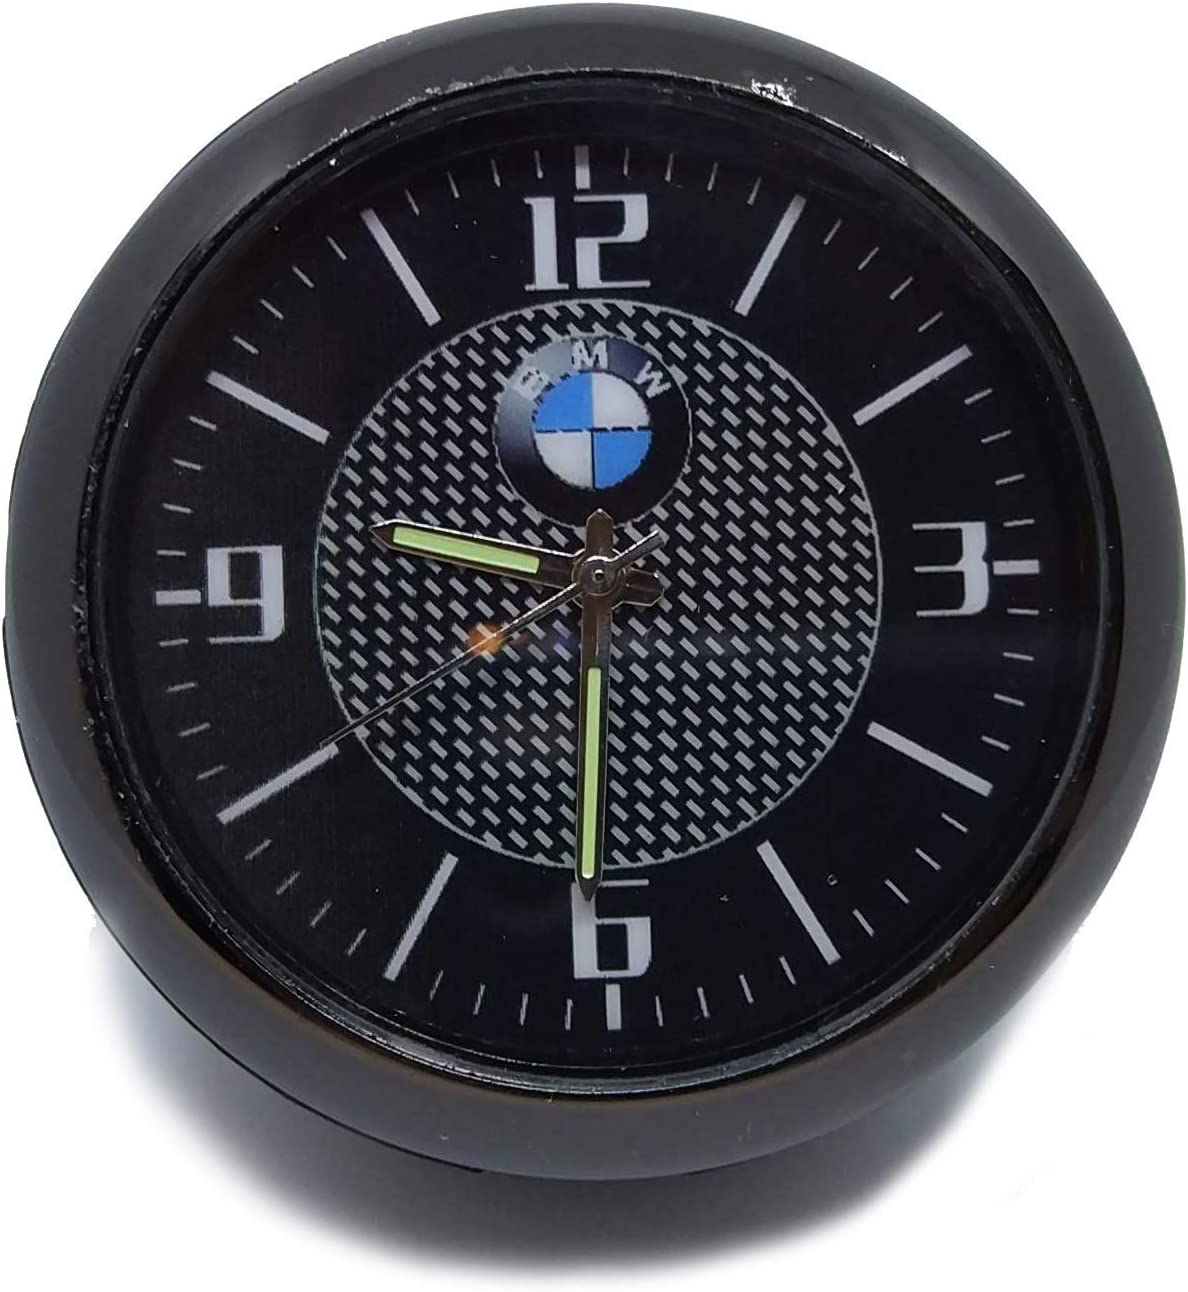 Reloj decoración para coche con logotipo de coche B